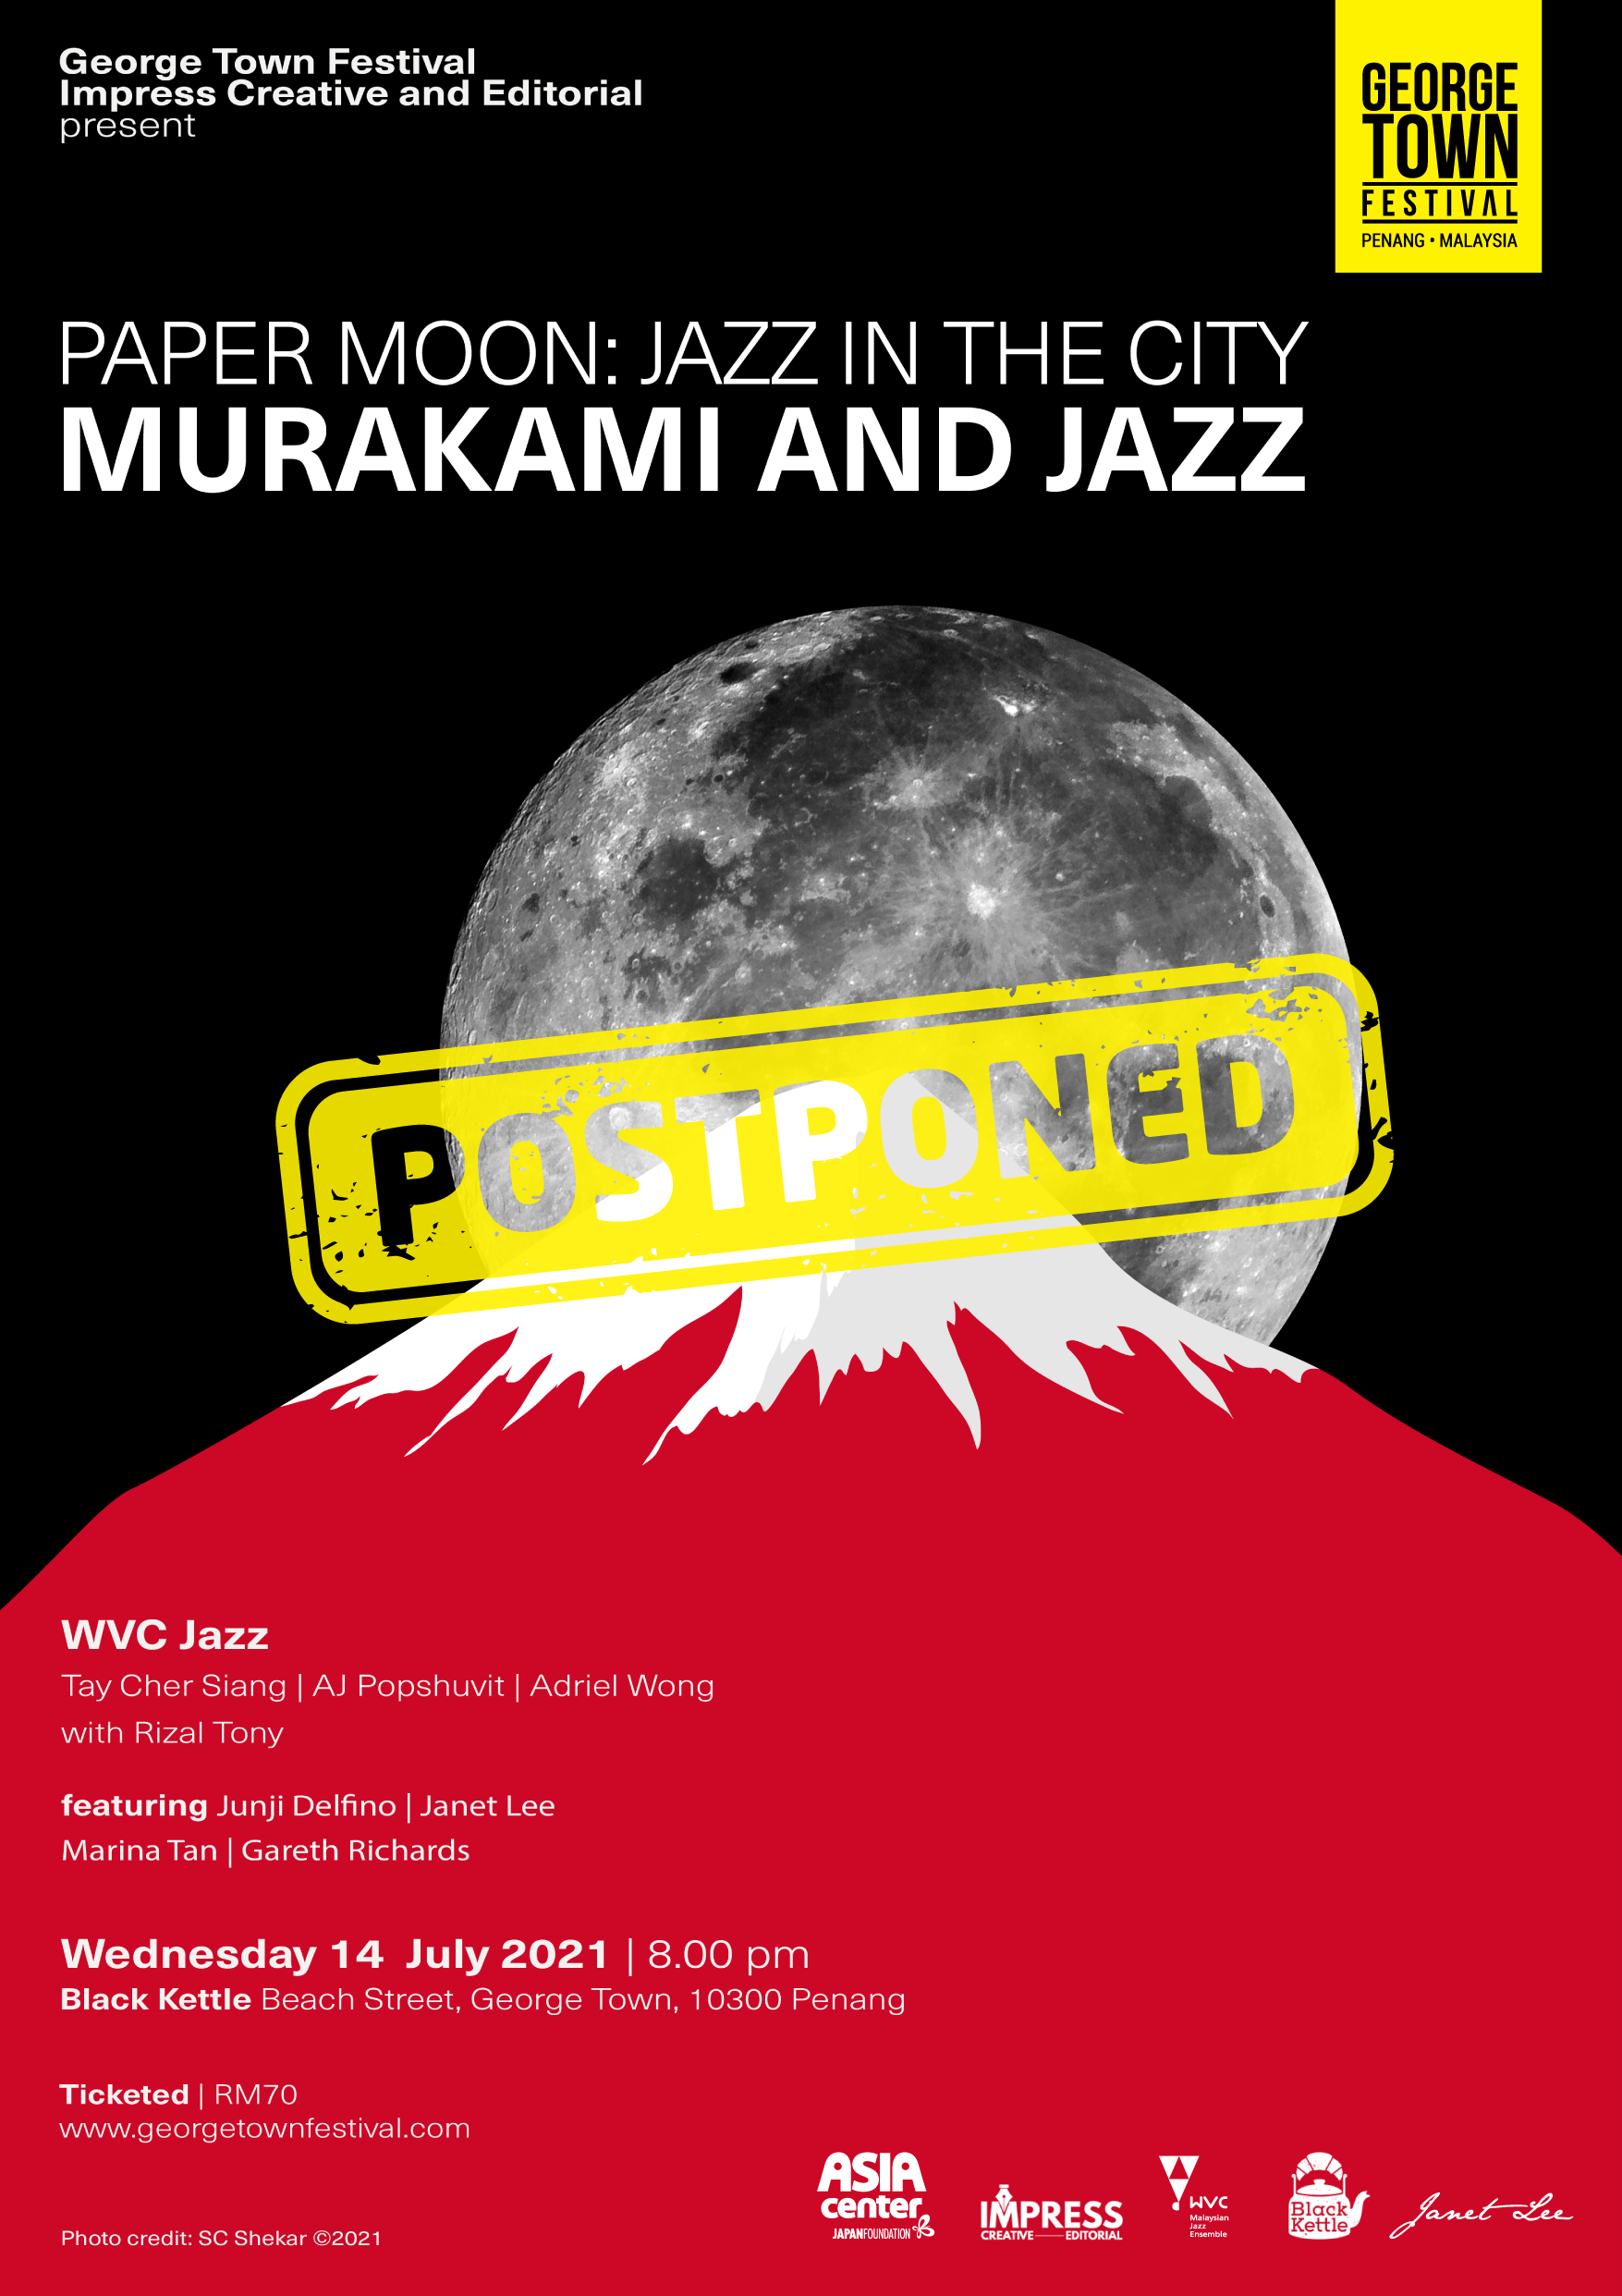 Paper Moon: Jazz in the City Murakami and Jazz